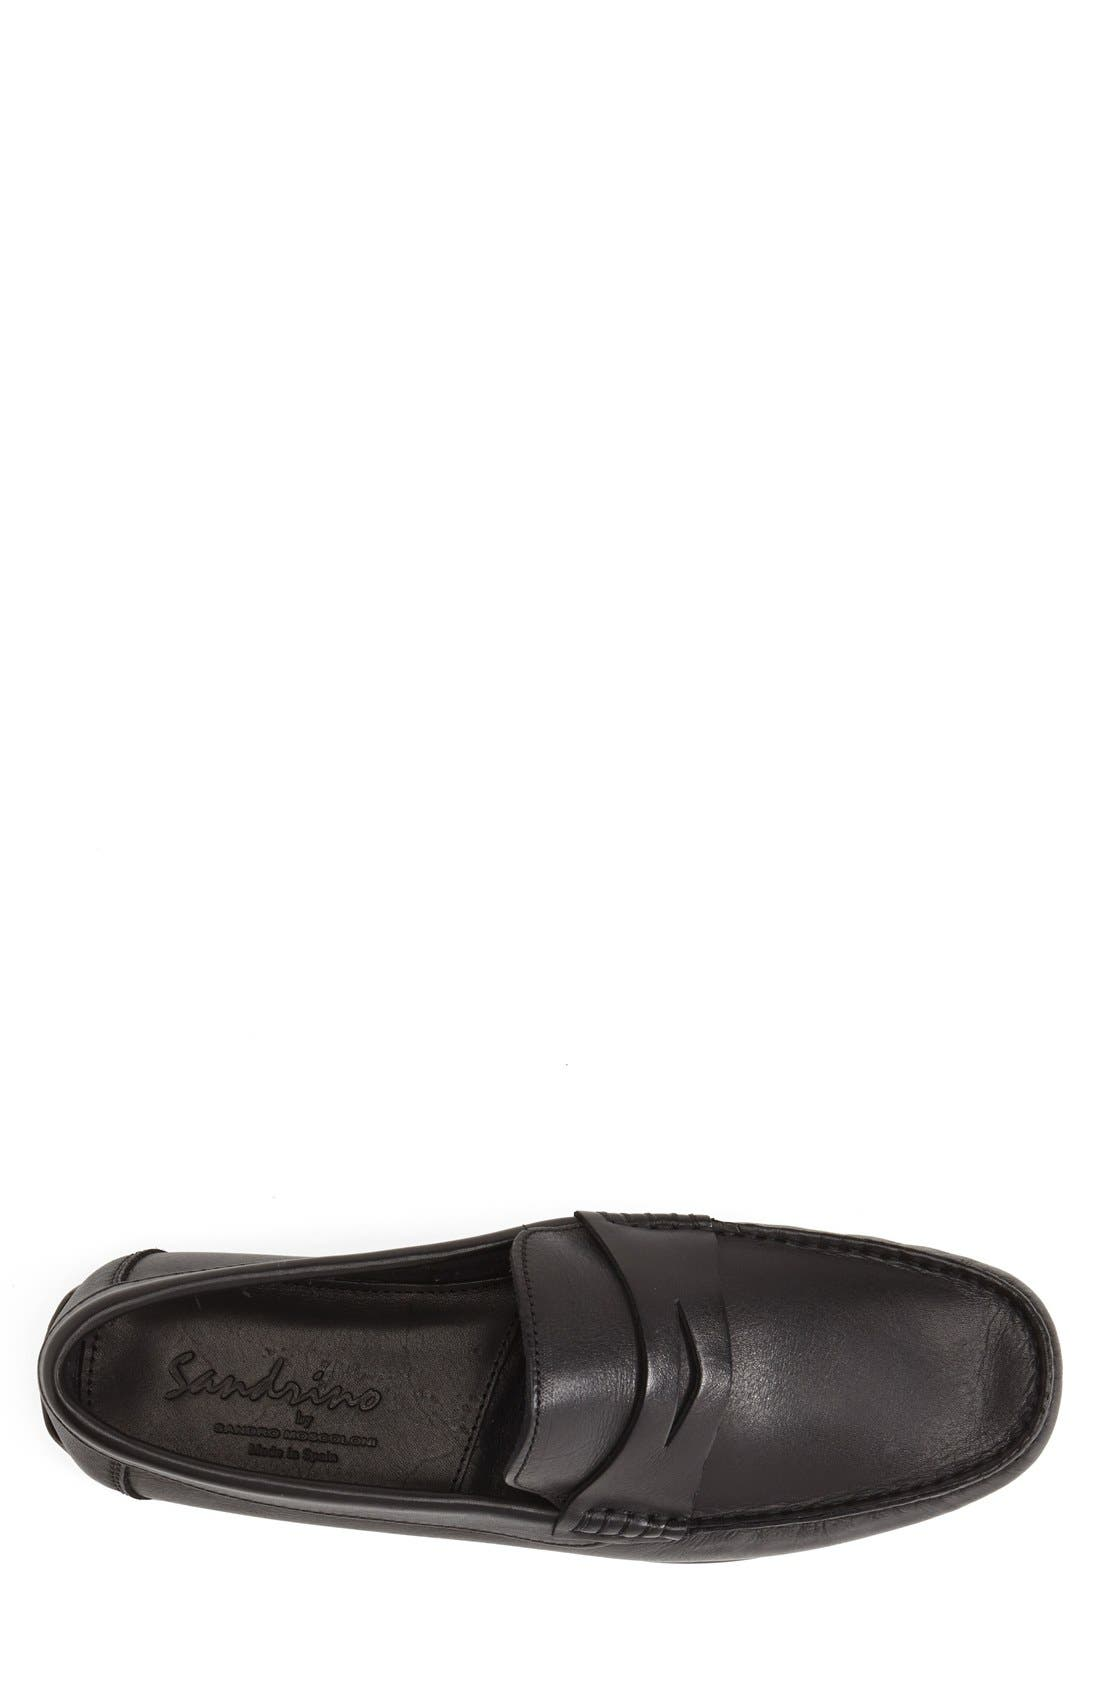 ,                             'Paris' Leather Penny Loafer,                             Alternate thumbnail 3, color,                             BLACK